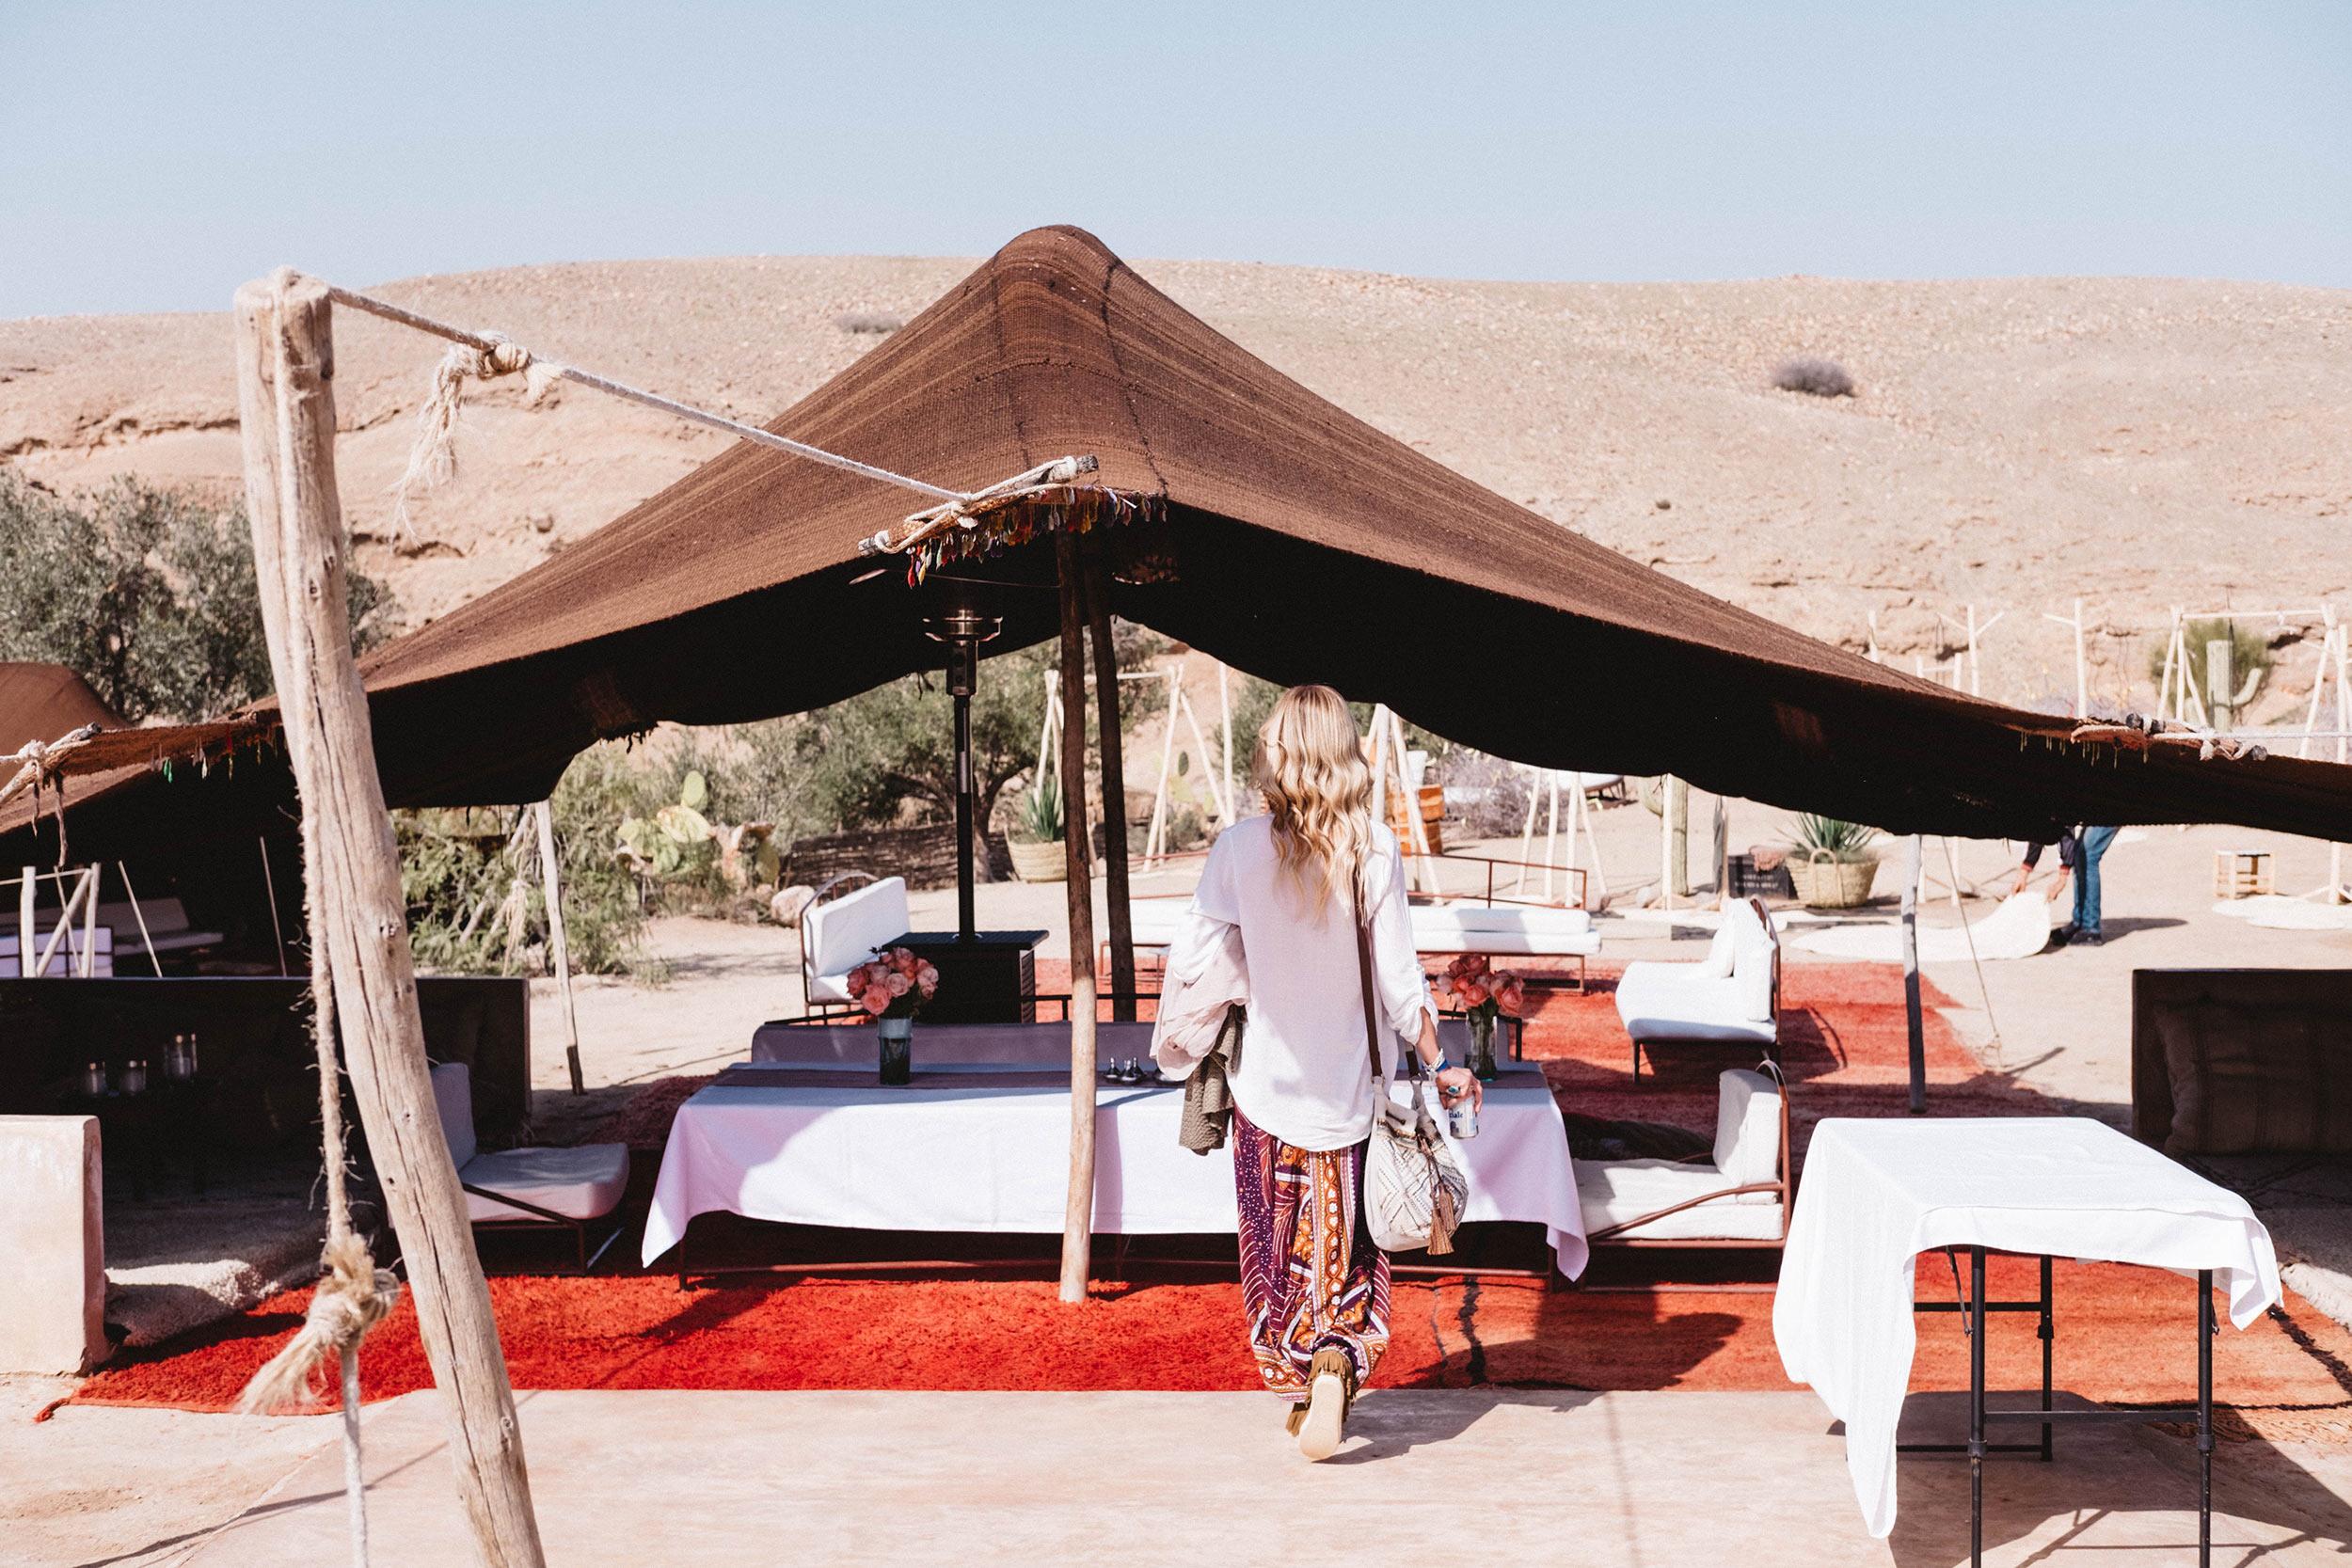 Morocco-6169.jpg